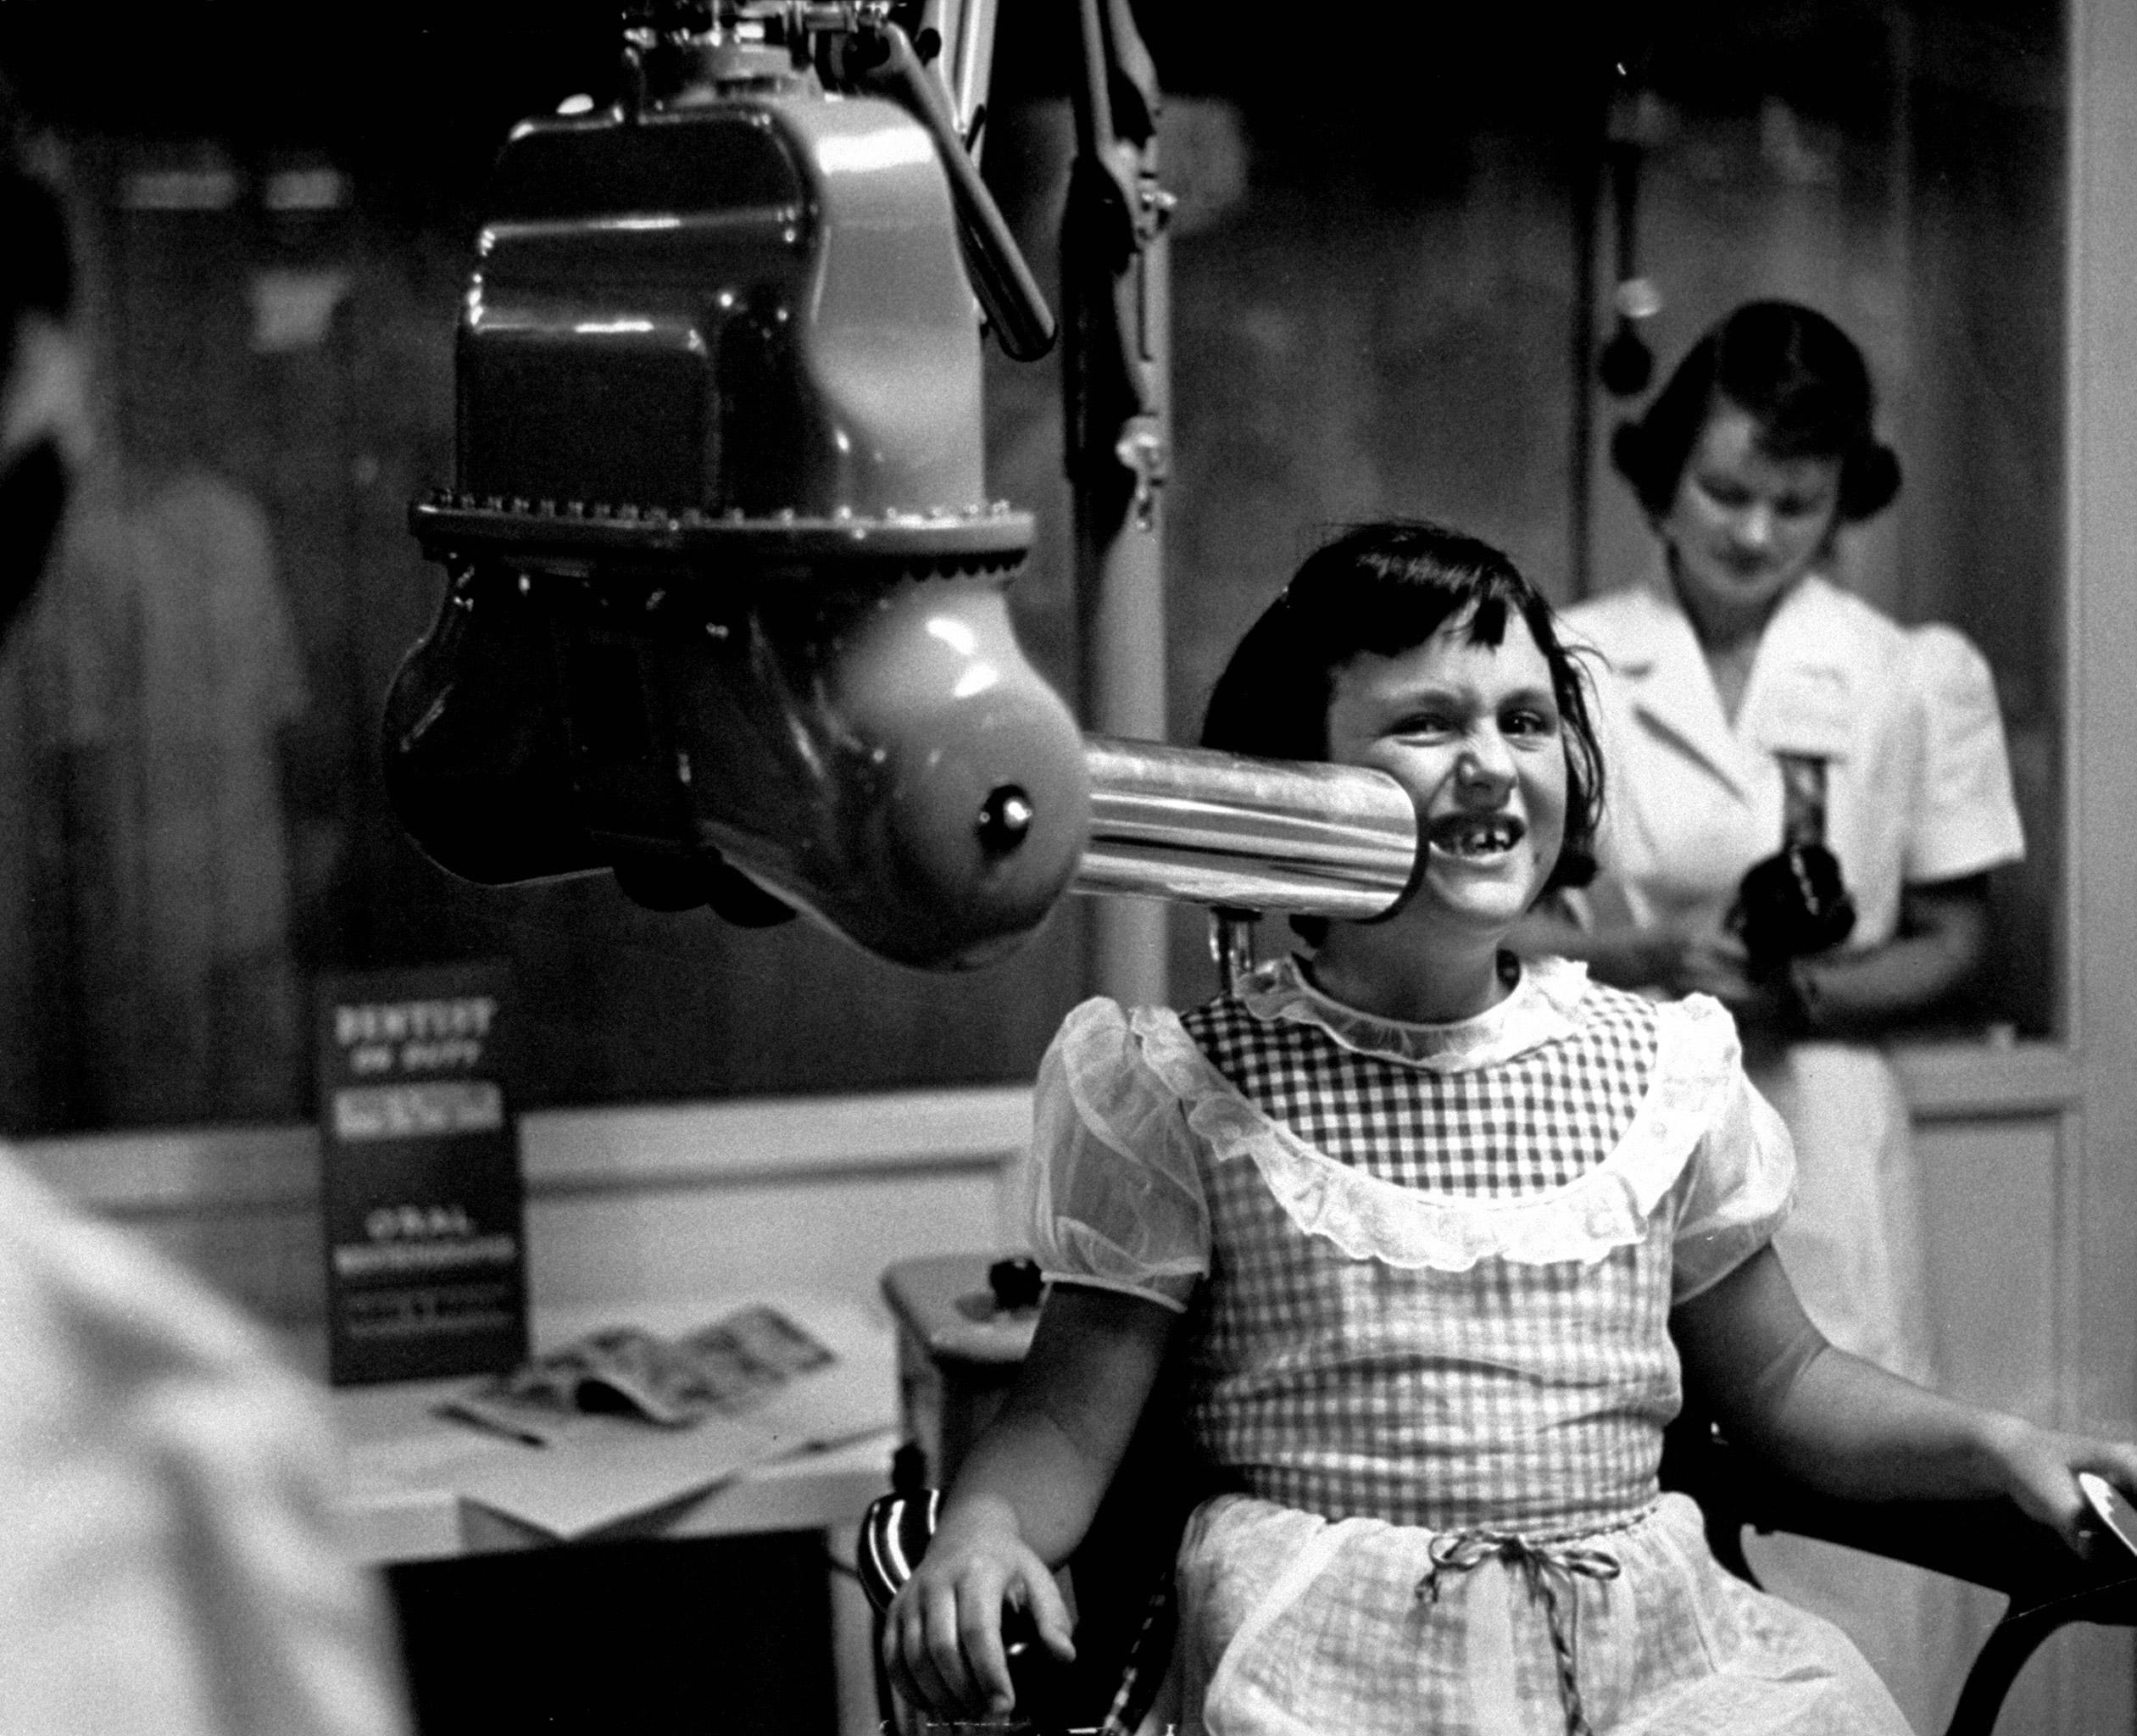 X-ray machine, at the California dental association exhibit, California state fair, 1953.